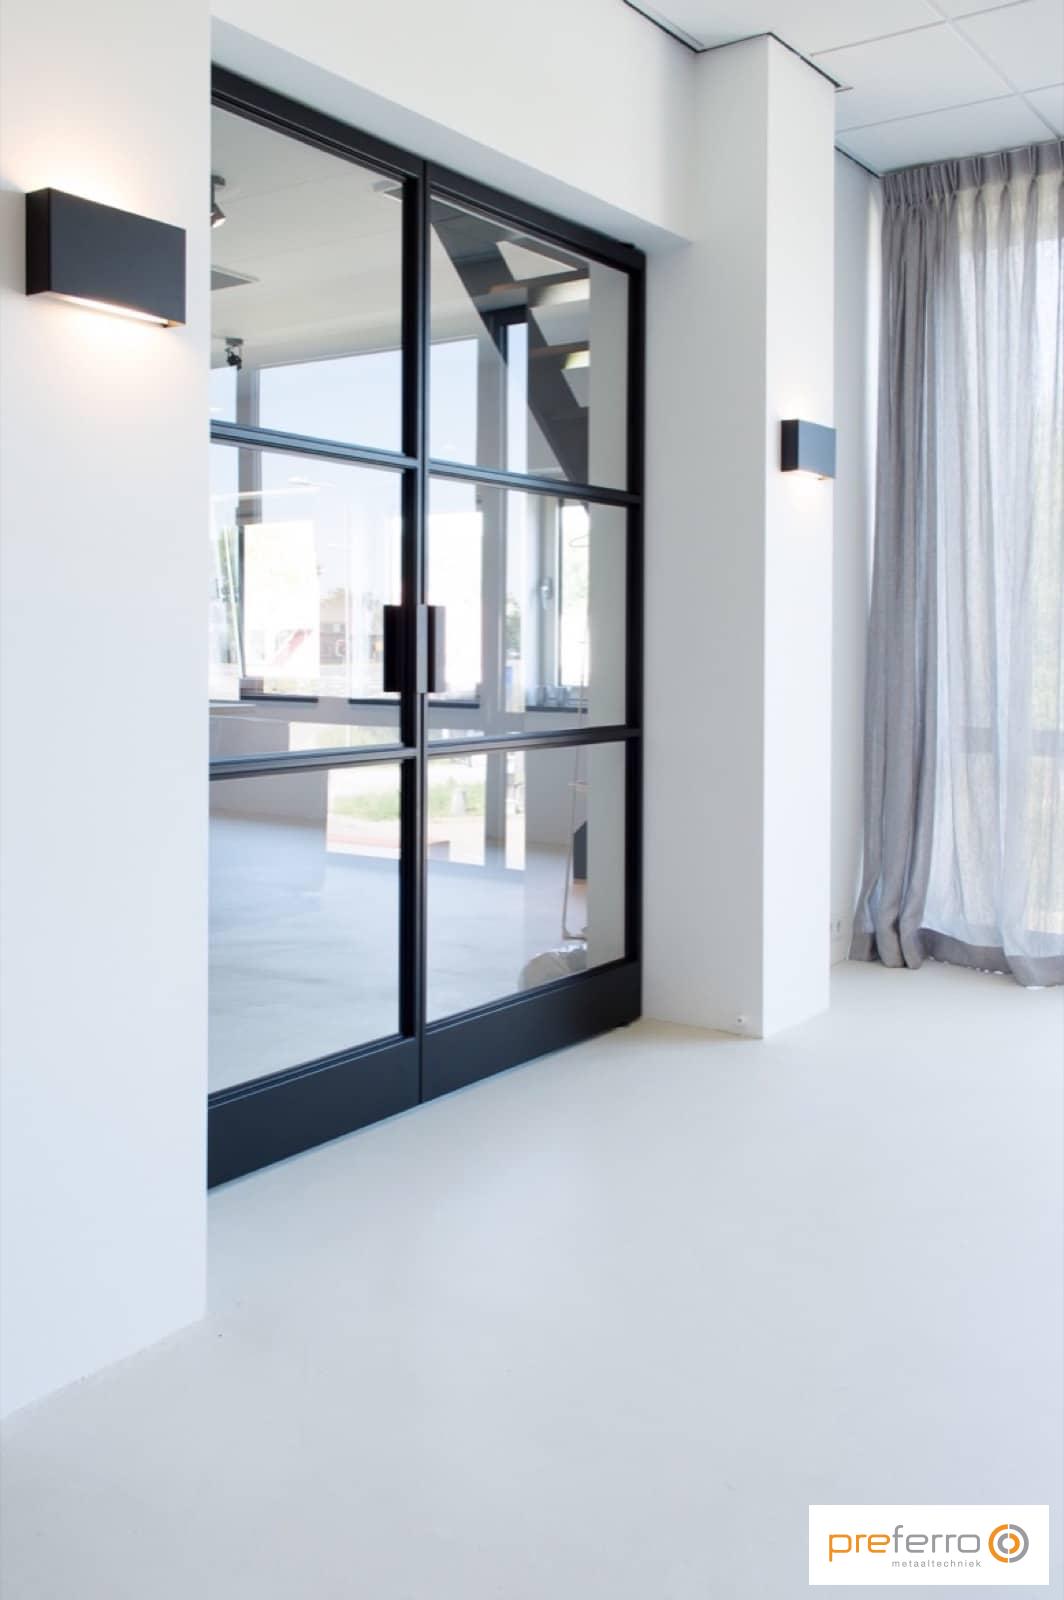 Dubbele binnendeuren met glas in woonkamer - Stalen deuren ...